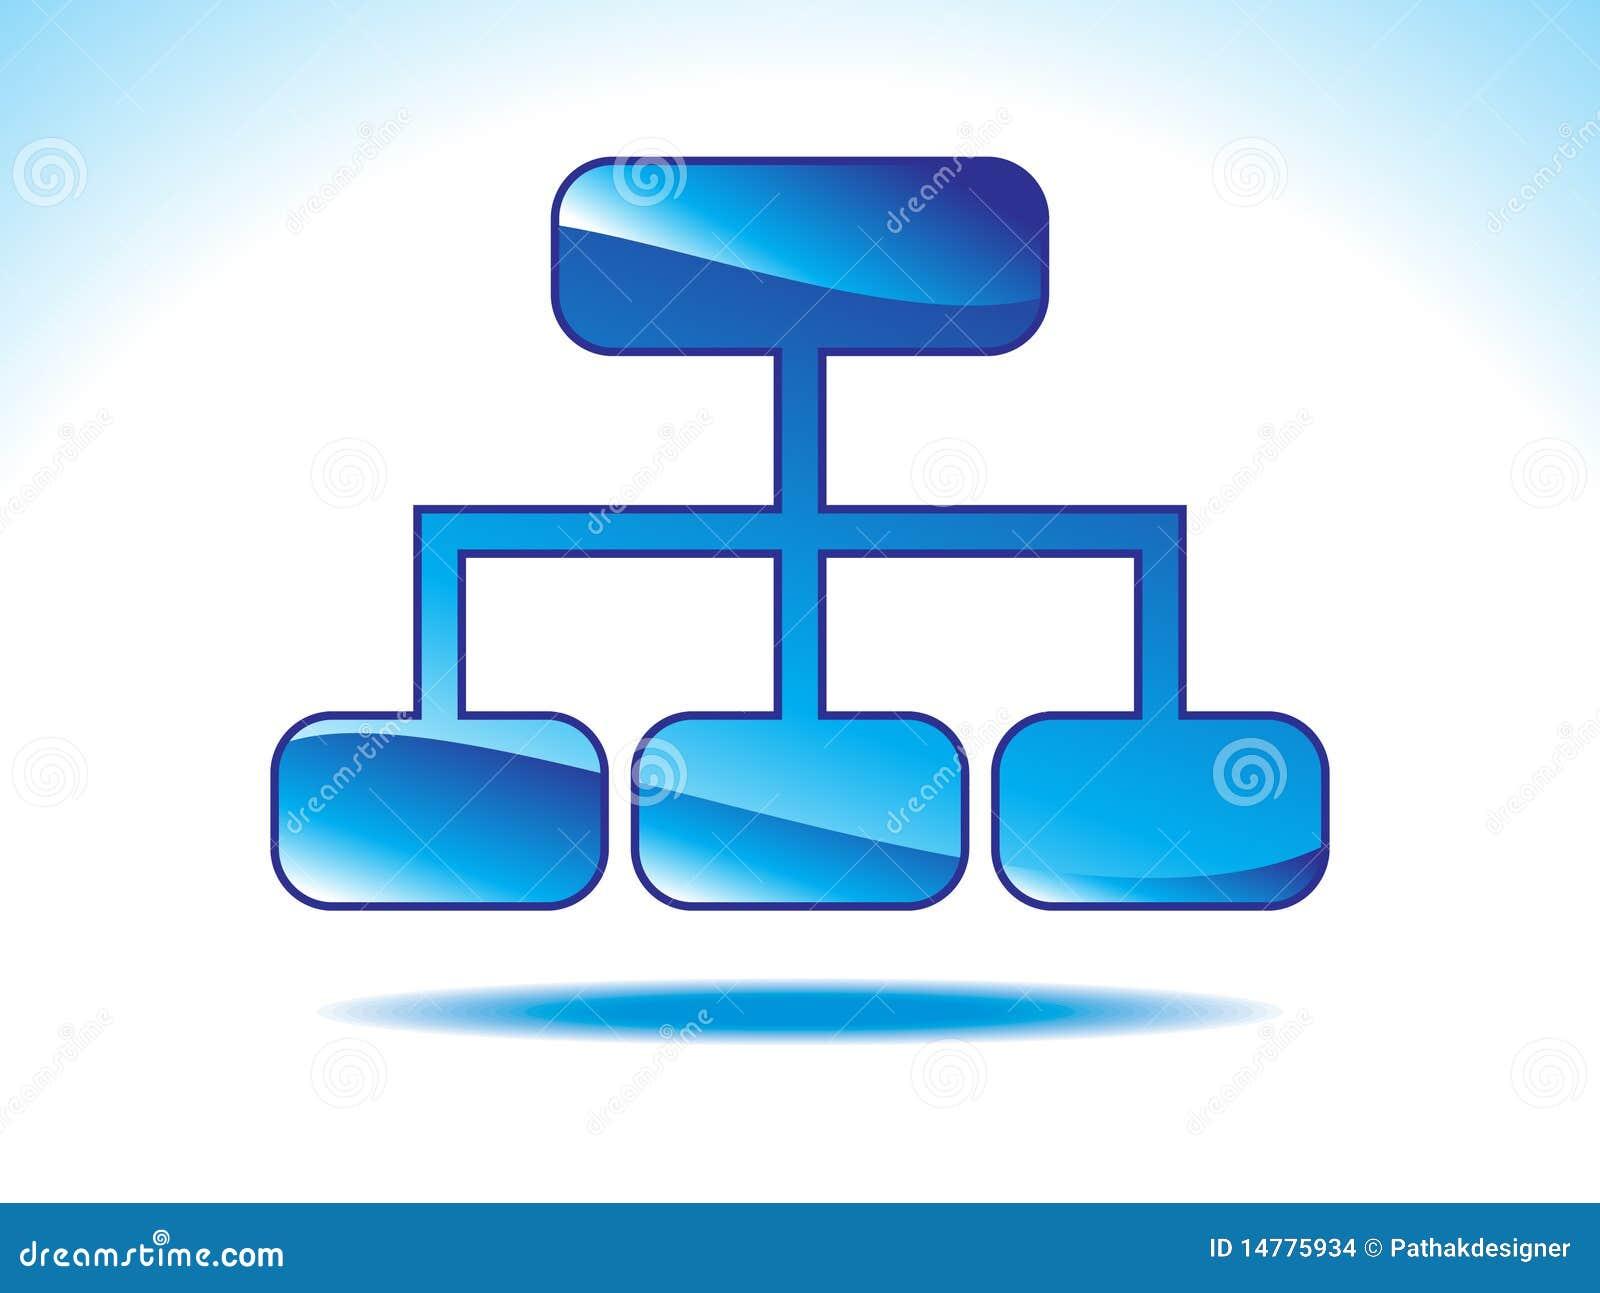 Abstract glanzend blauw sitemappictogram